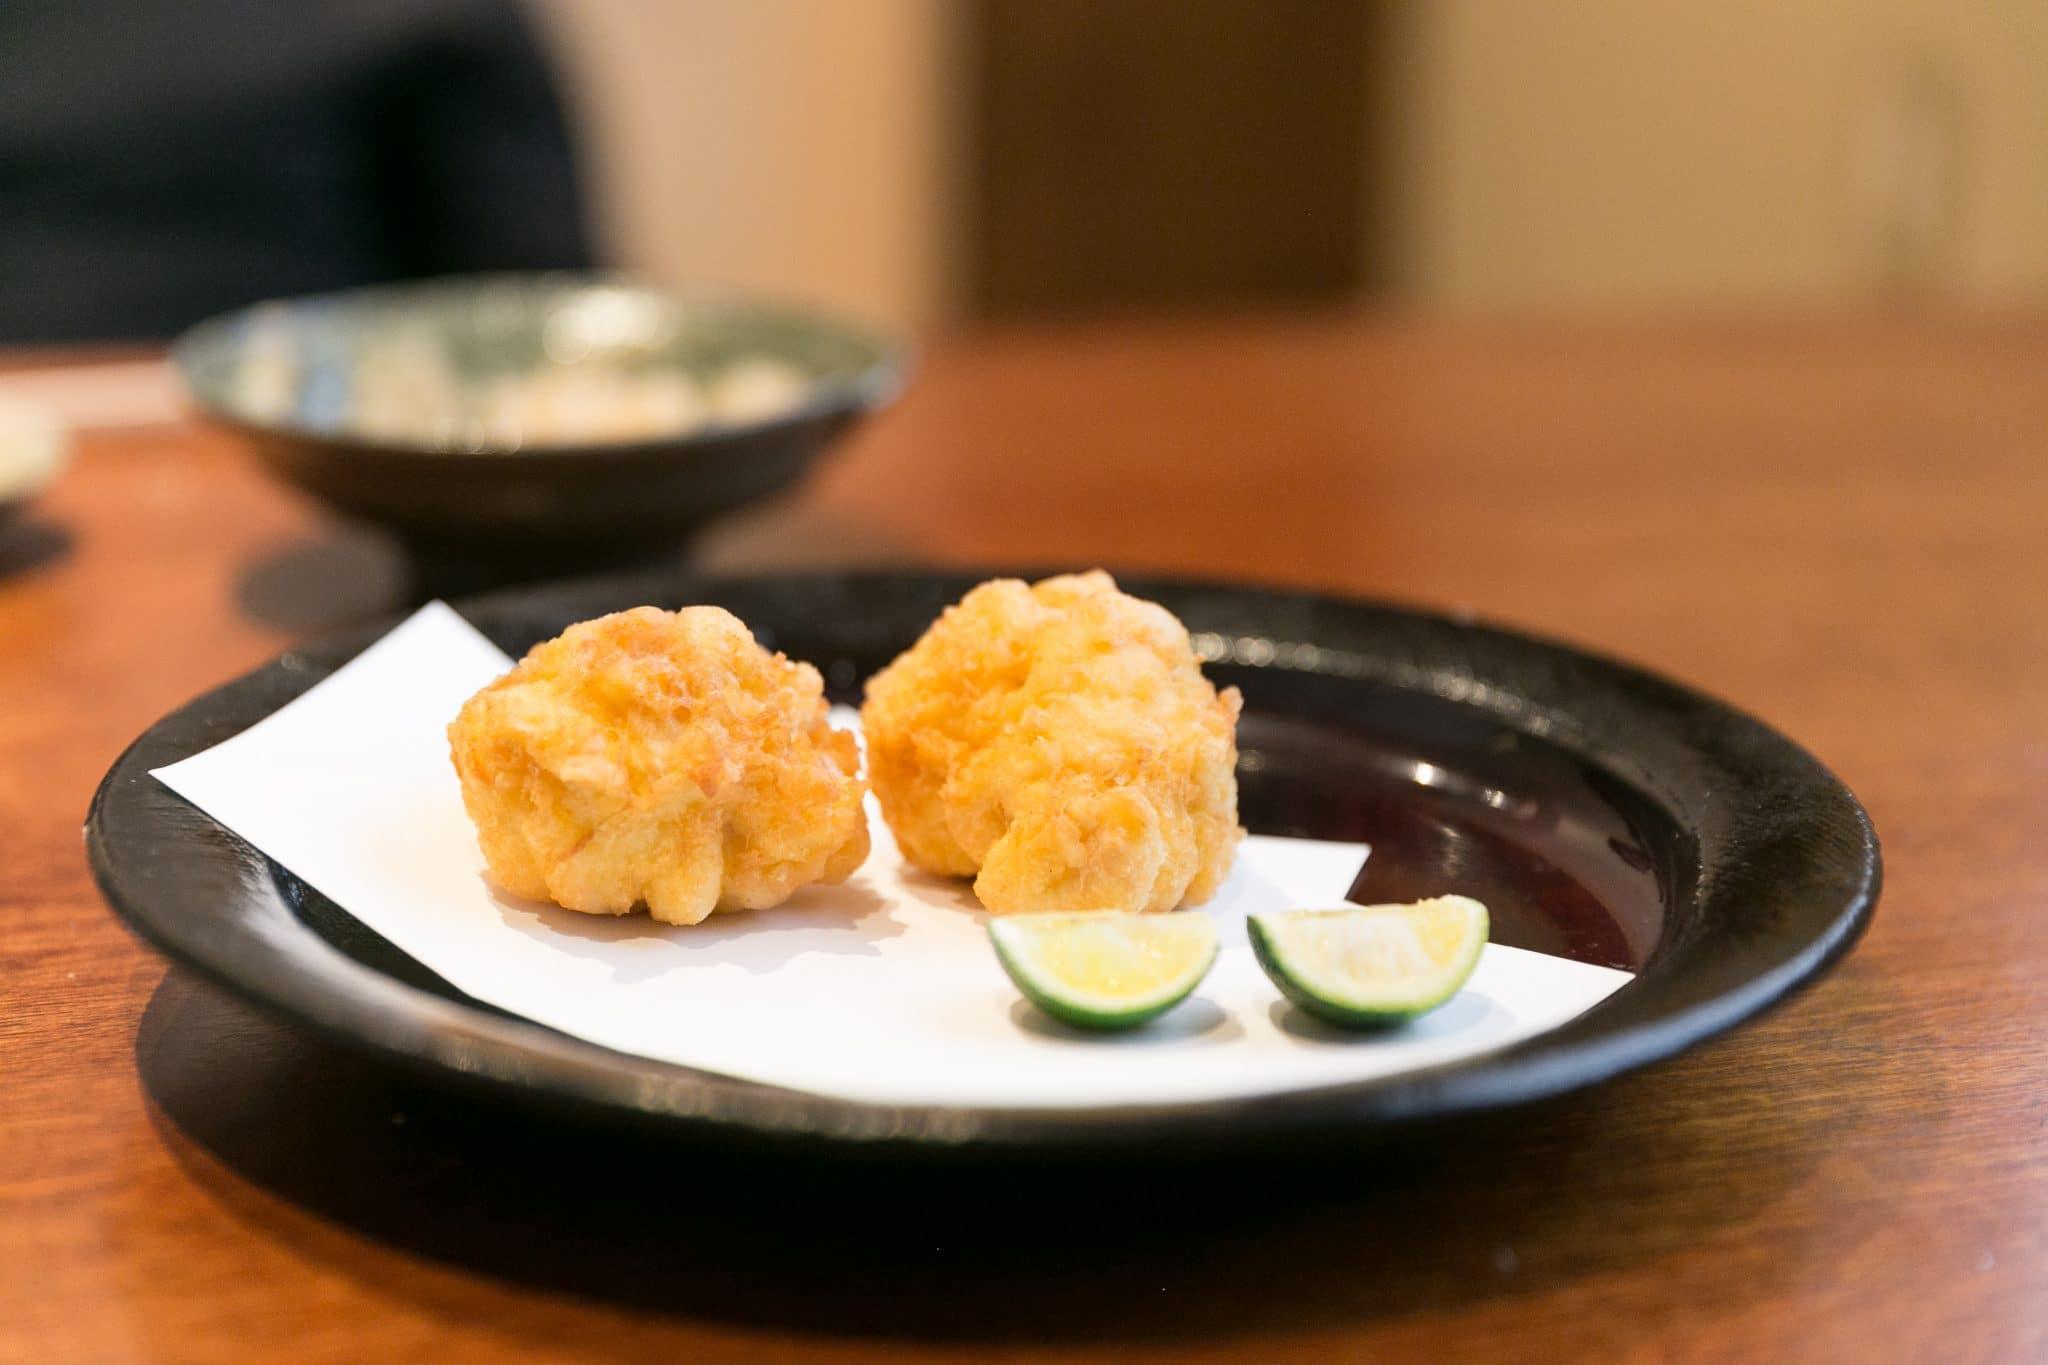 exotic seafood dishes, egg custard tarts